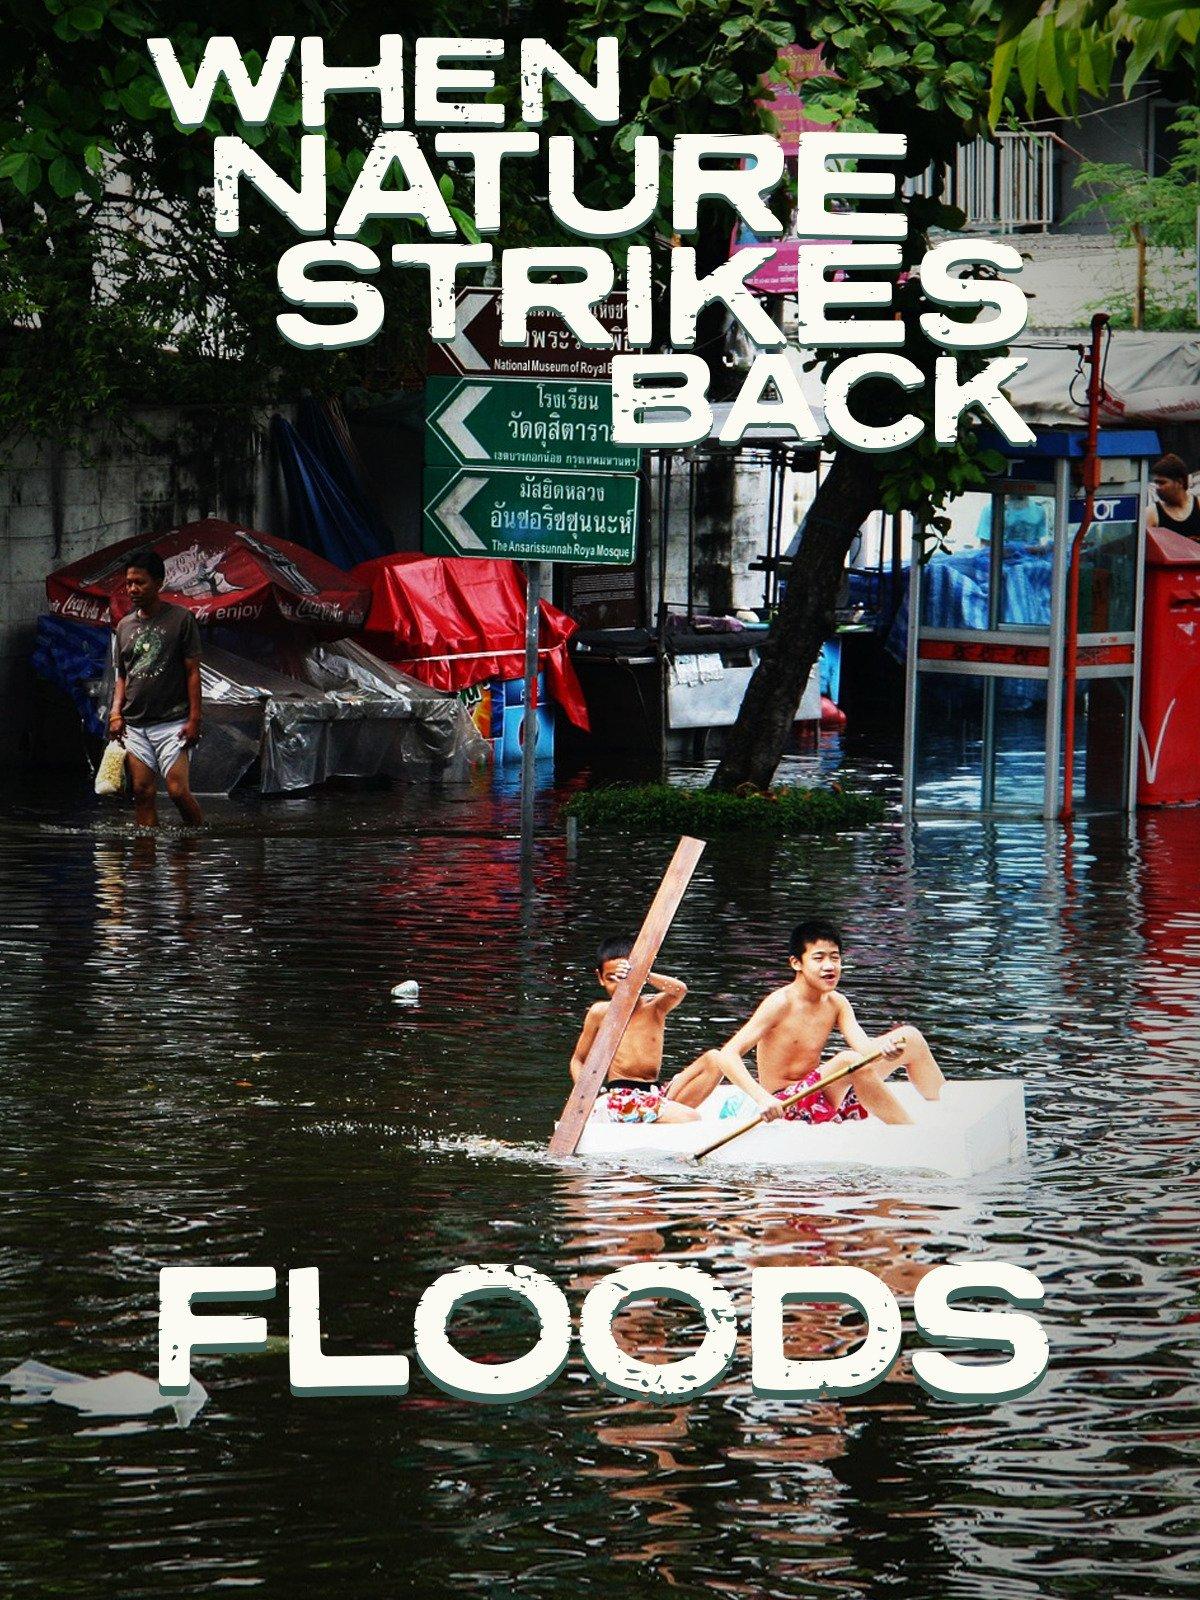 When Nature Strikes Back: Floods on Amazon Prime Video UK